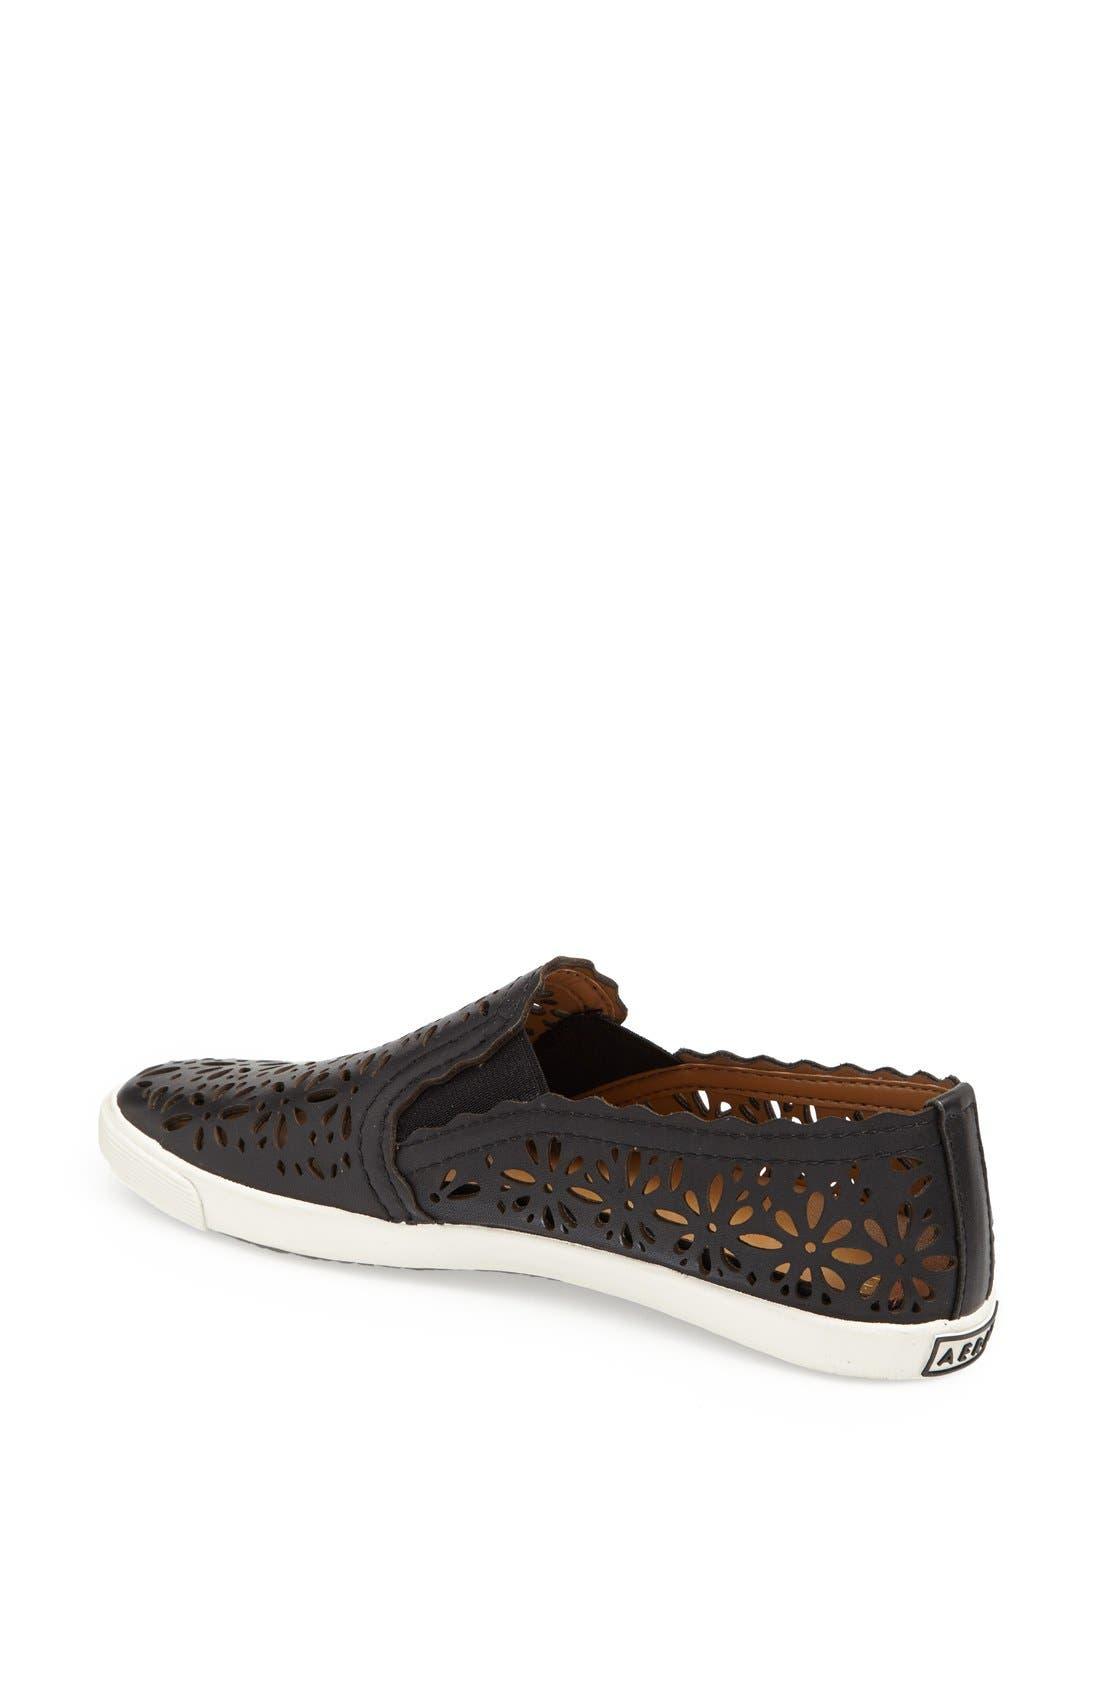 AERIN,                             'Murex' Perforated Slip-On Sneaker,                             Alternate thumbnail 4, color,                             001